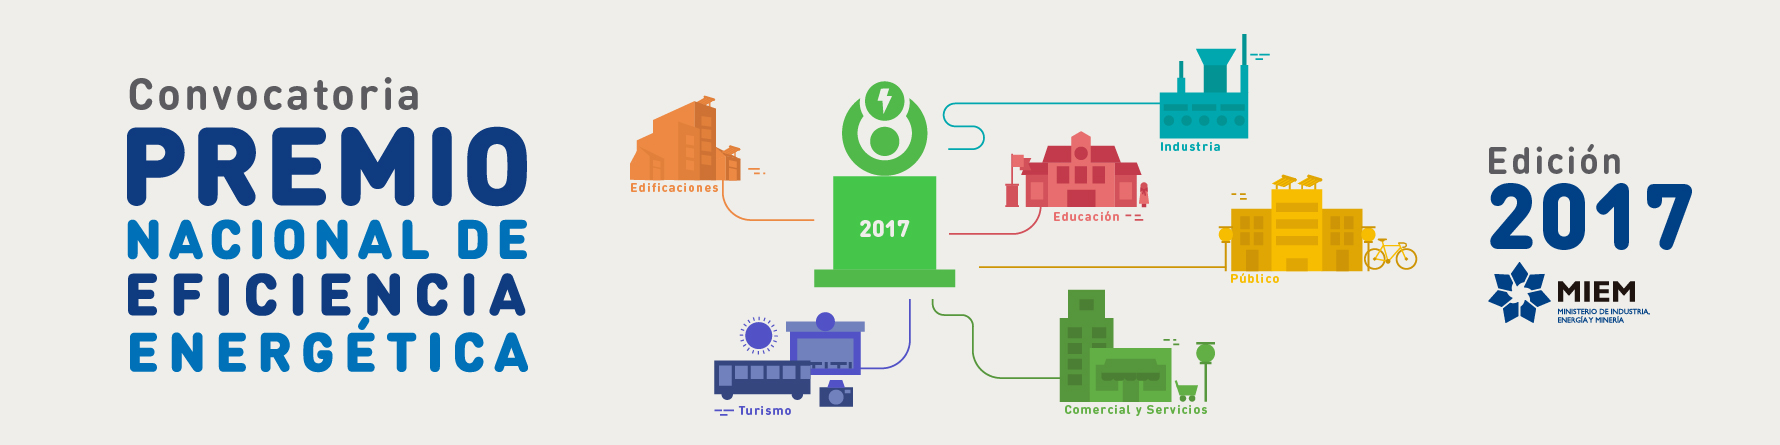 Convocatoria Premio Nacional de Eficiencia Energética 2017